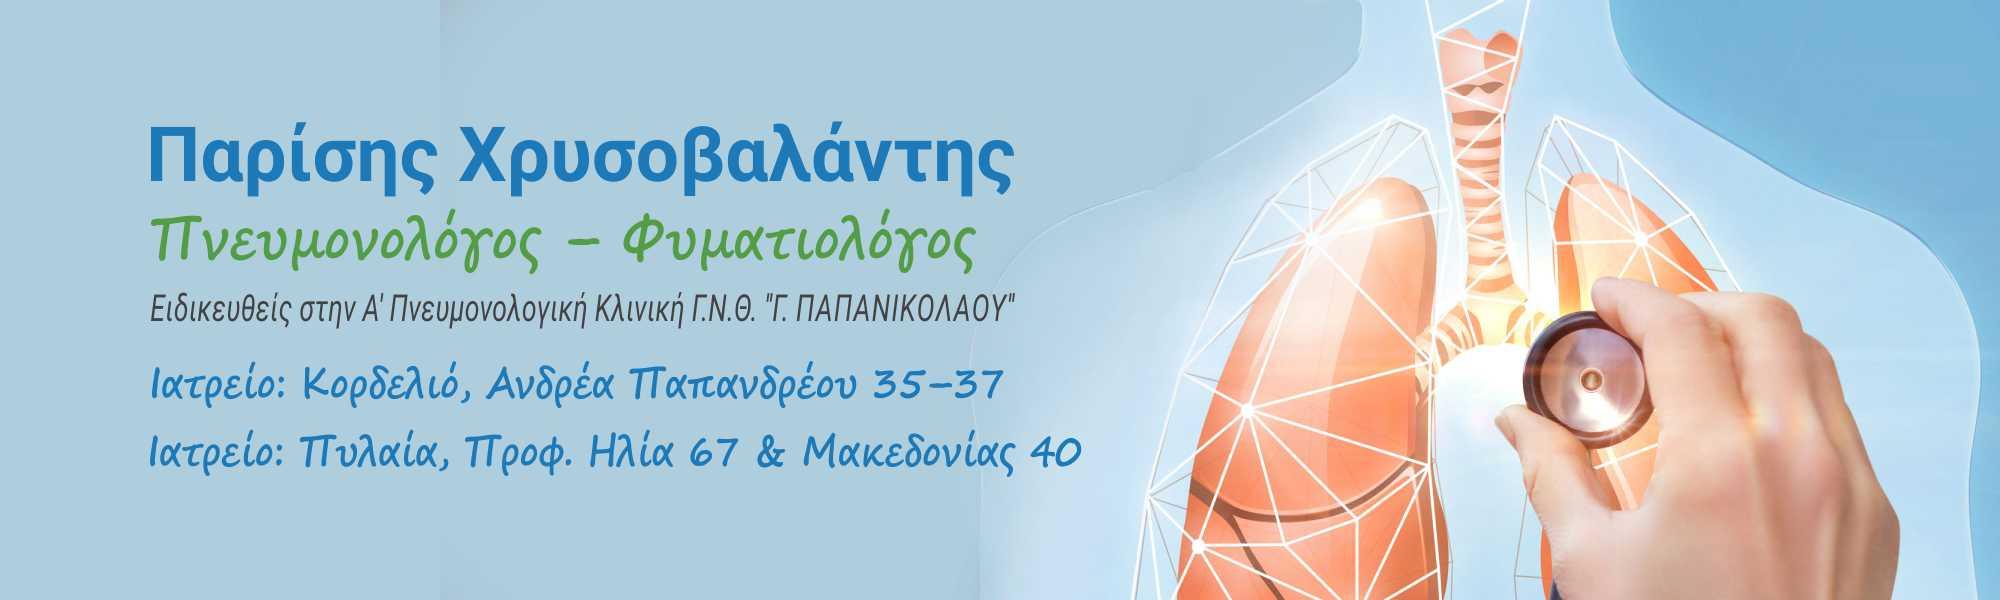 Pulmology-3a-Parisis-Thessaloniki